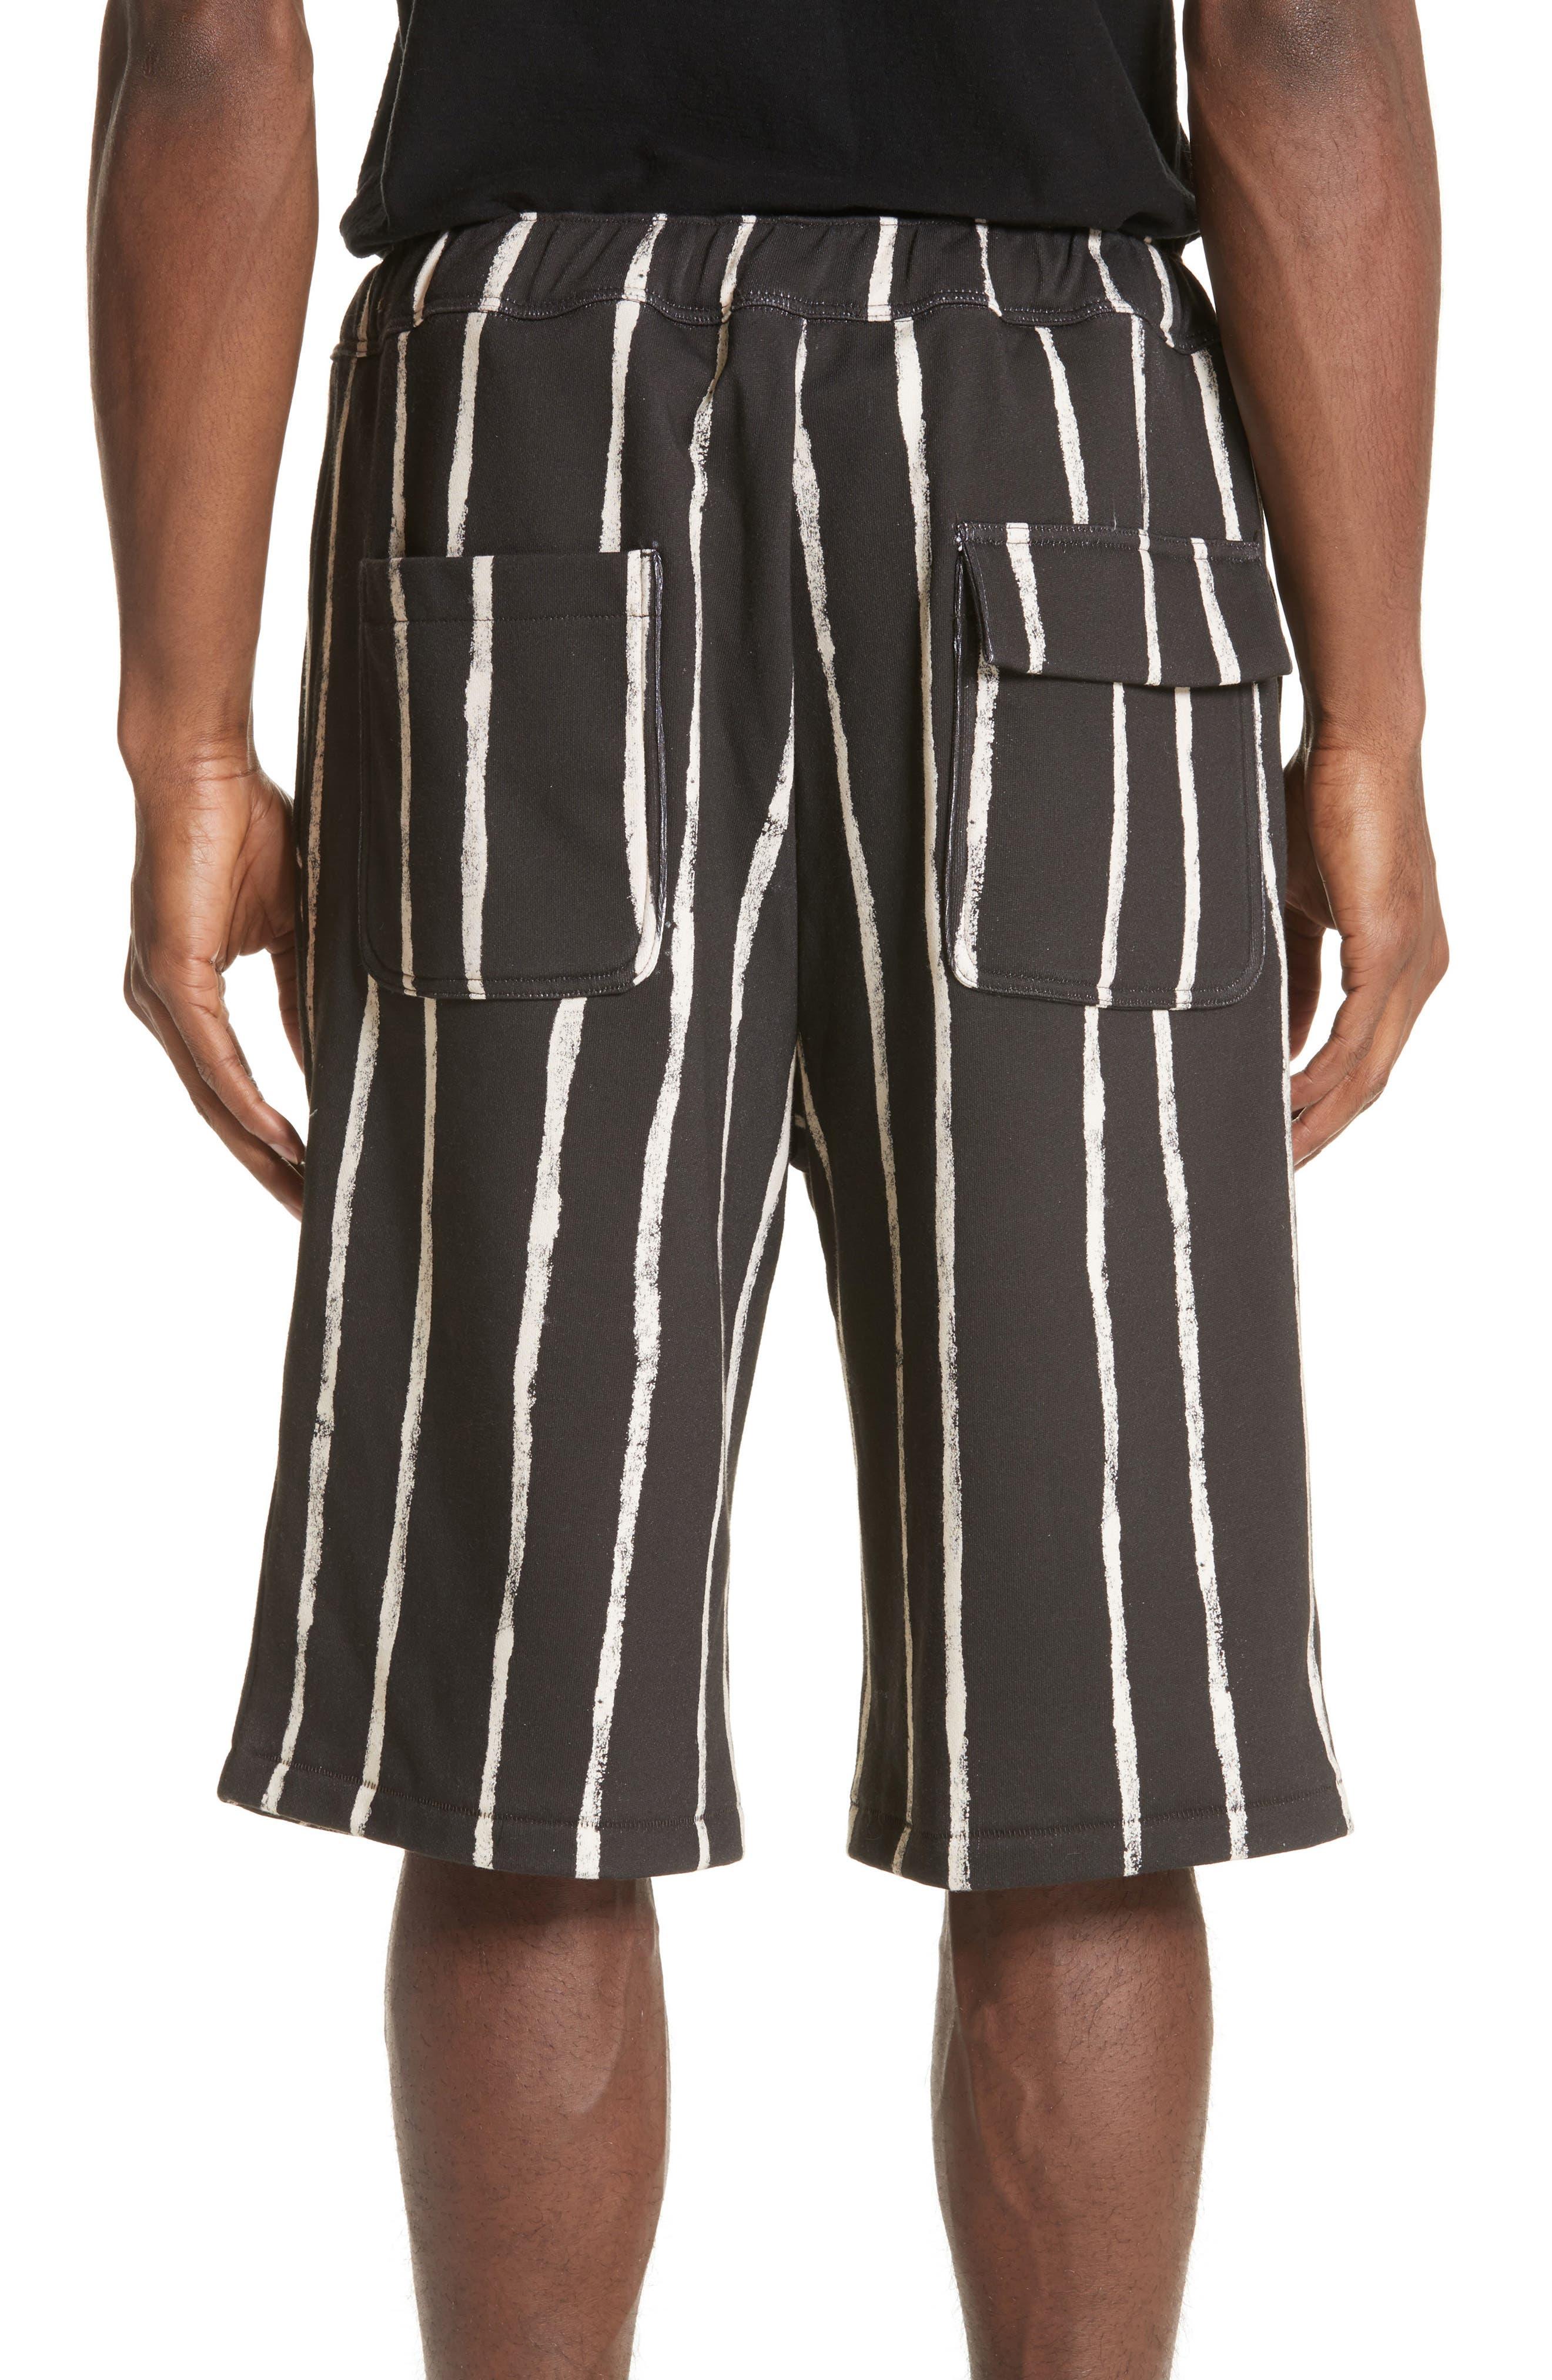 Striped Paint Shorts,                             Alternate thumbnail 2, color,                             001